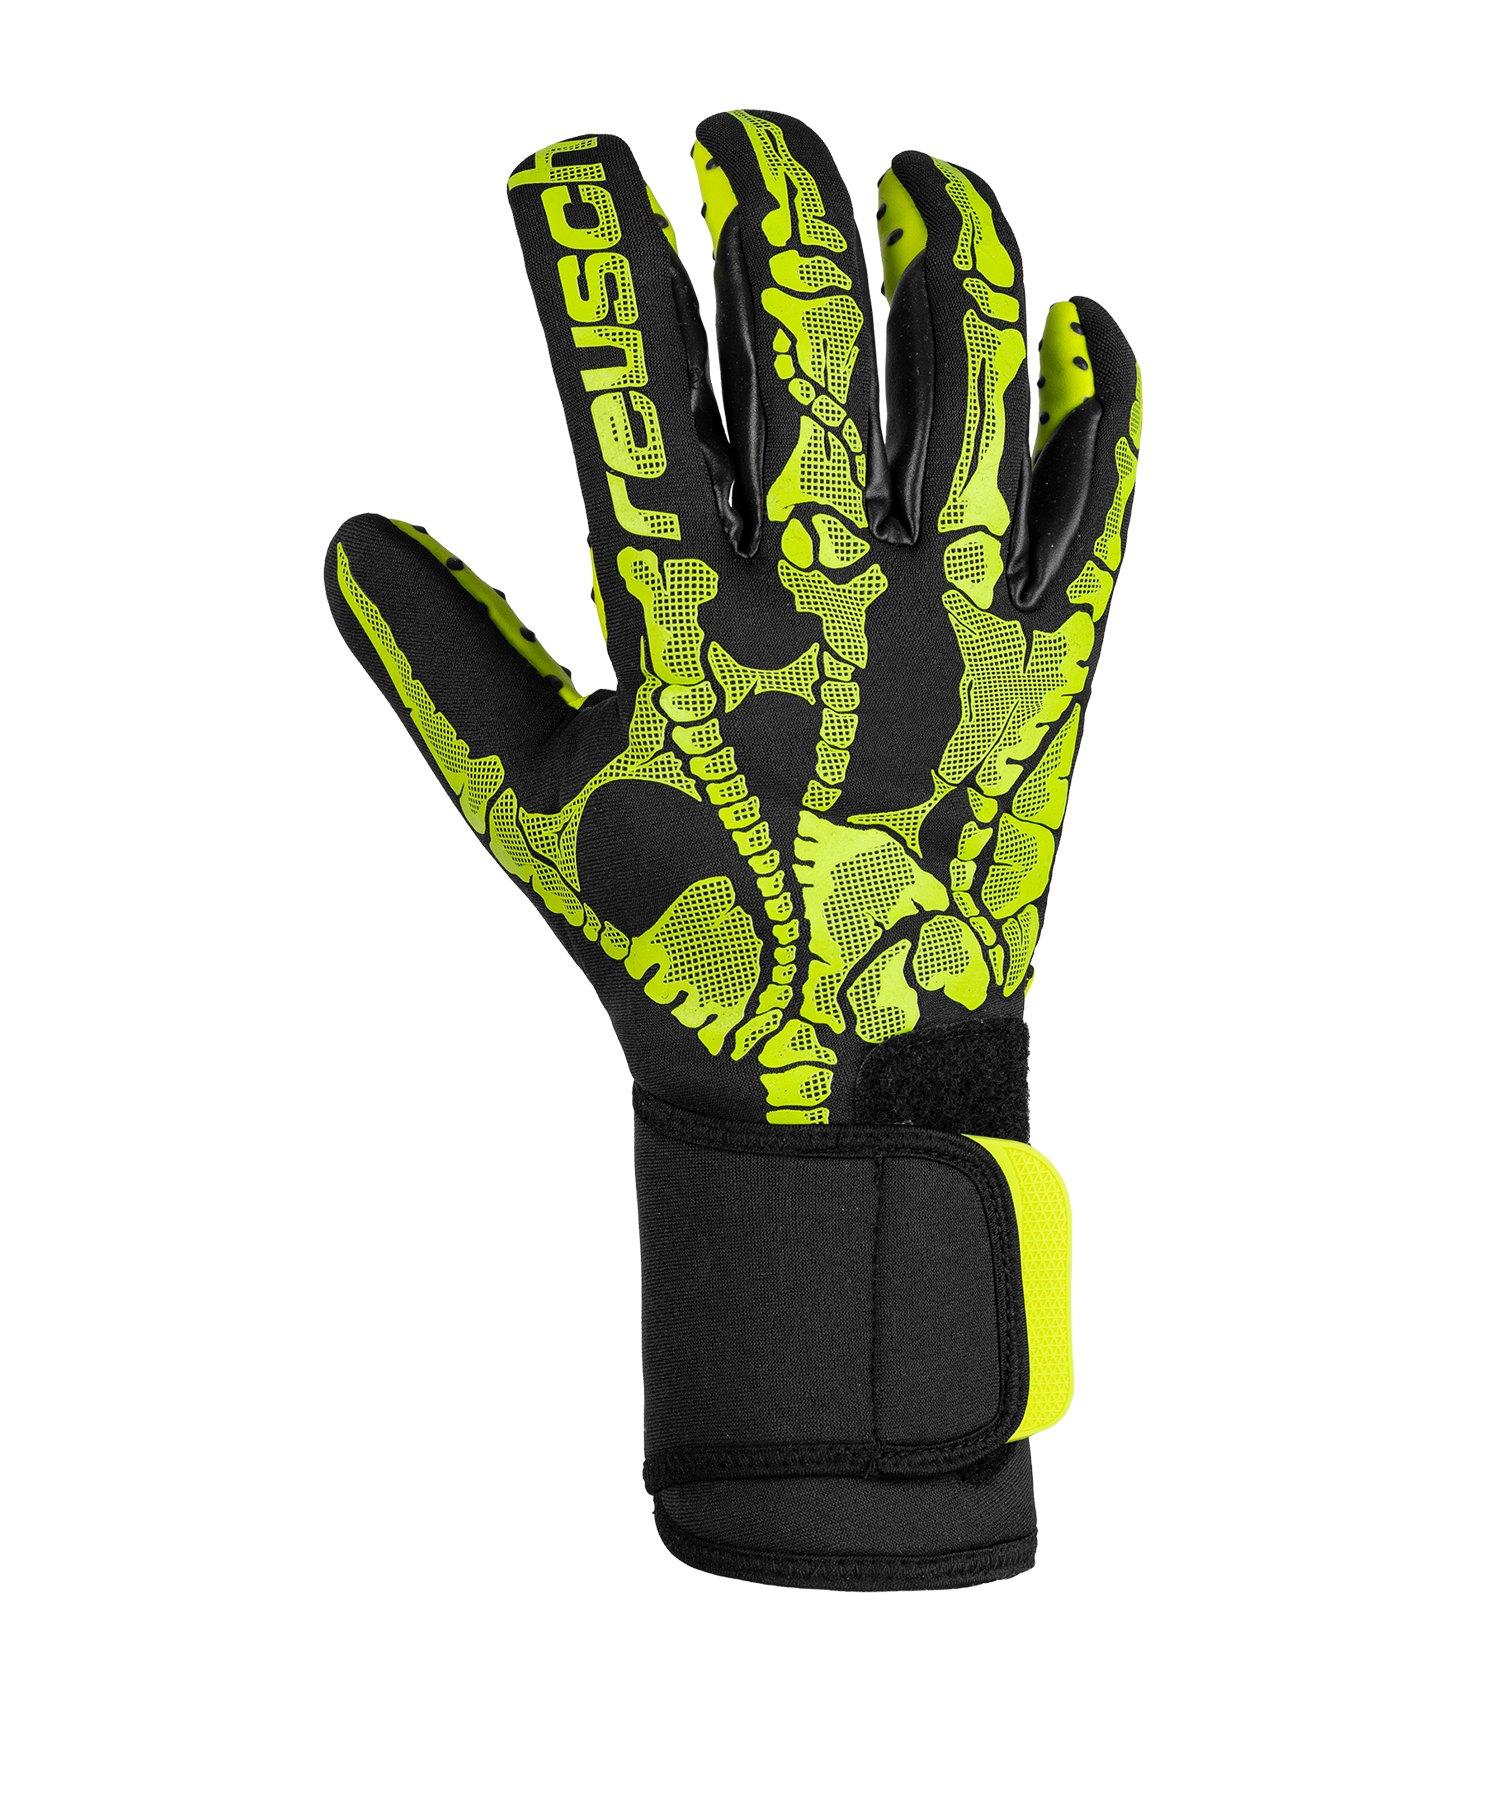 Reusch Pure Contact X-RAY G3 TW-Handschuh F7040 - schwarz